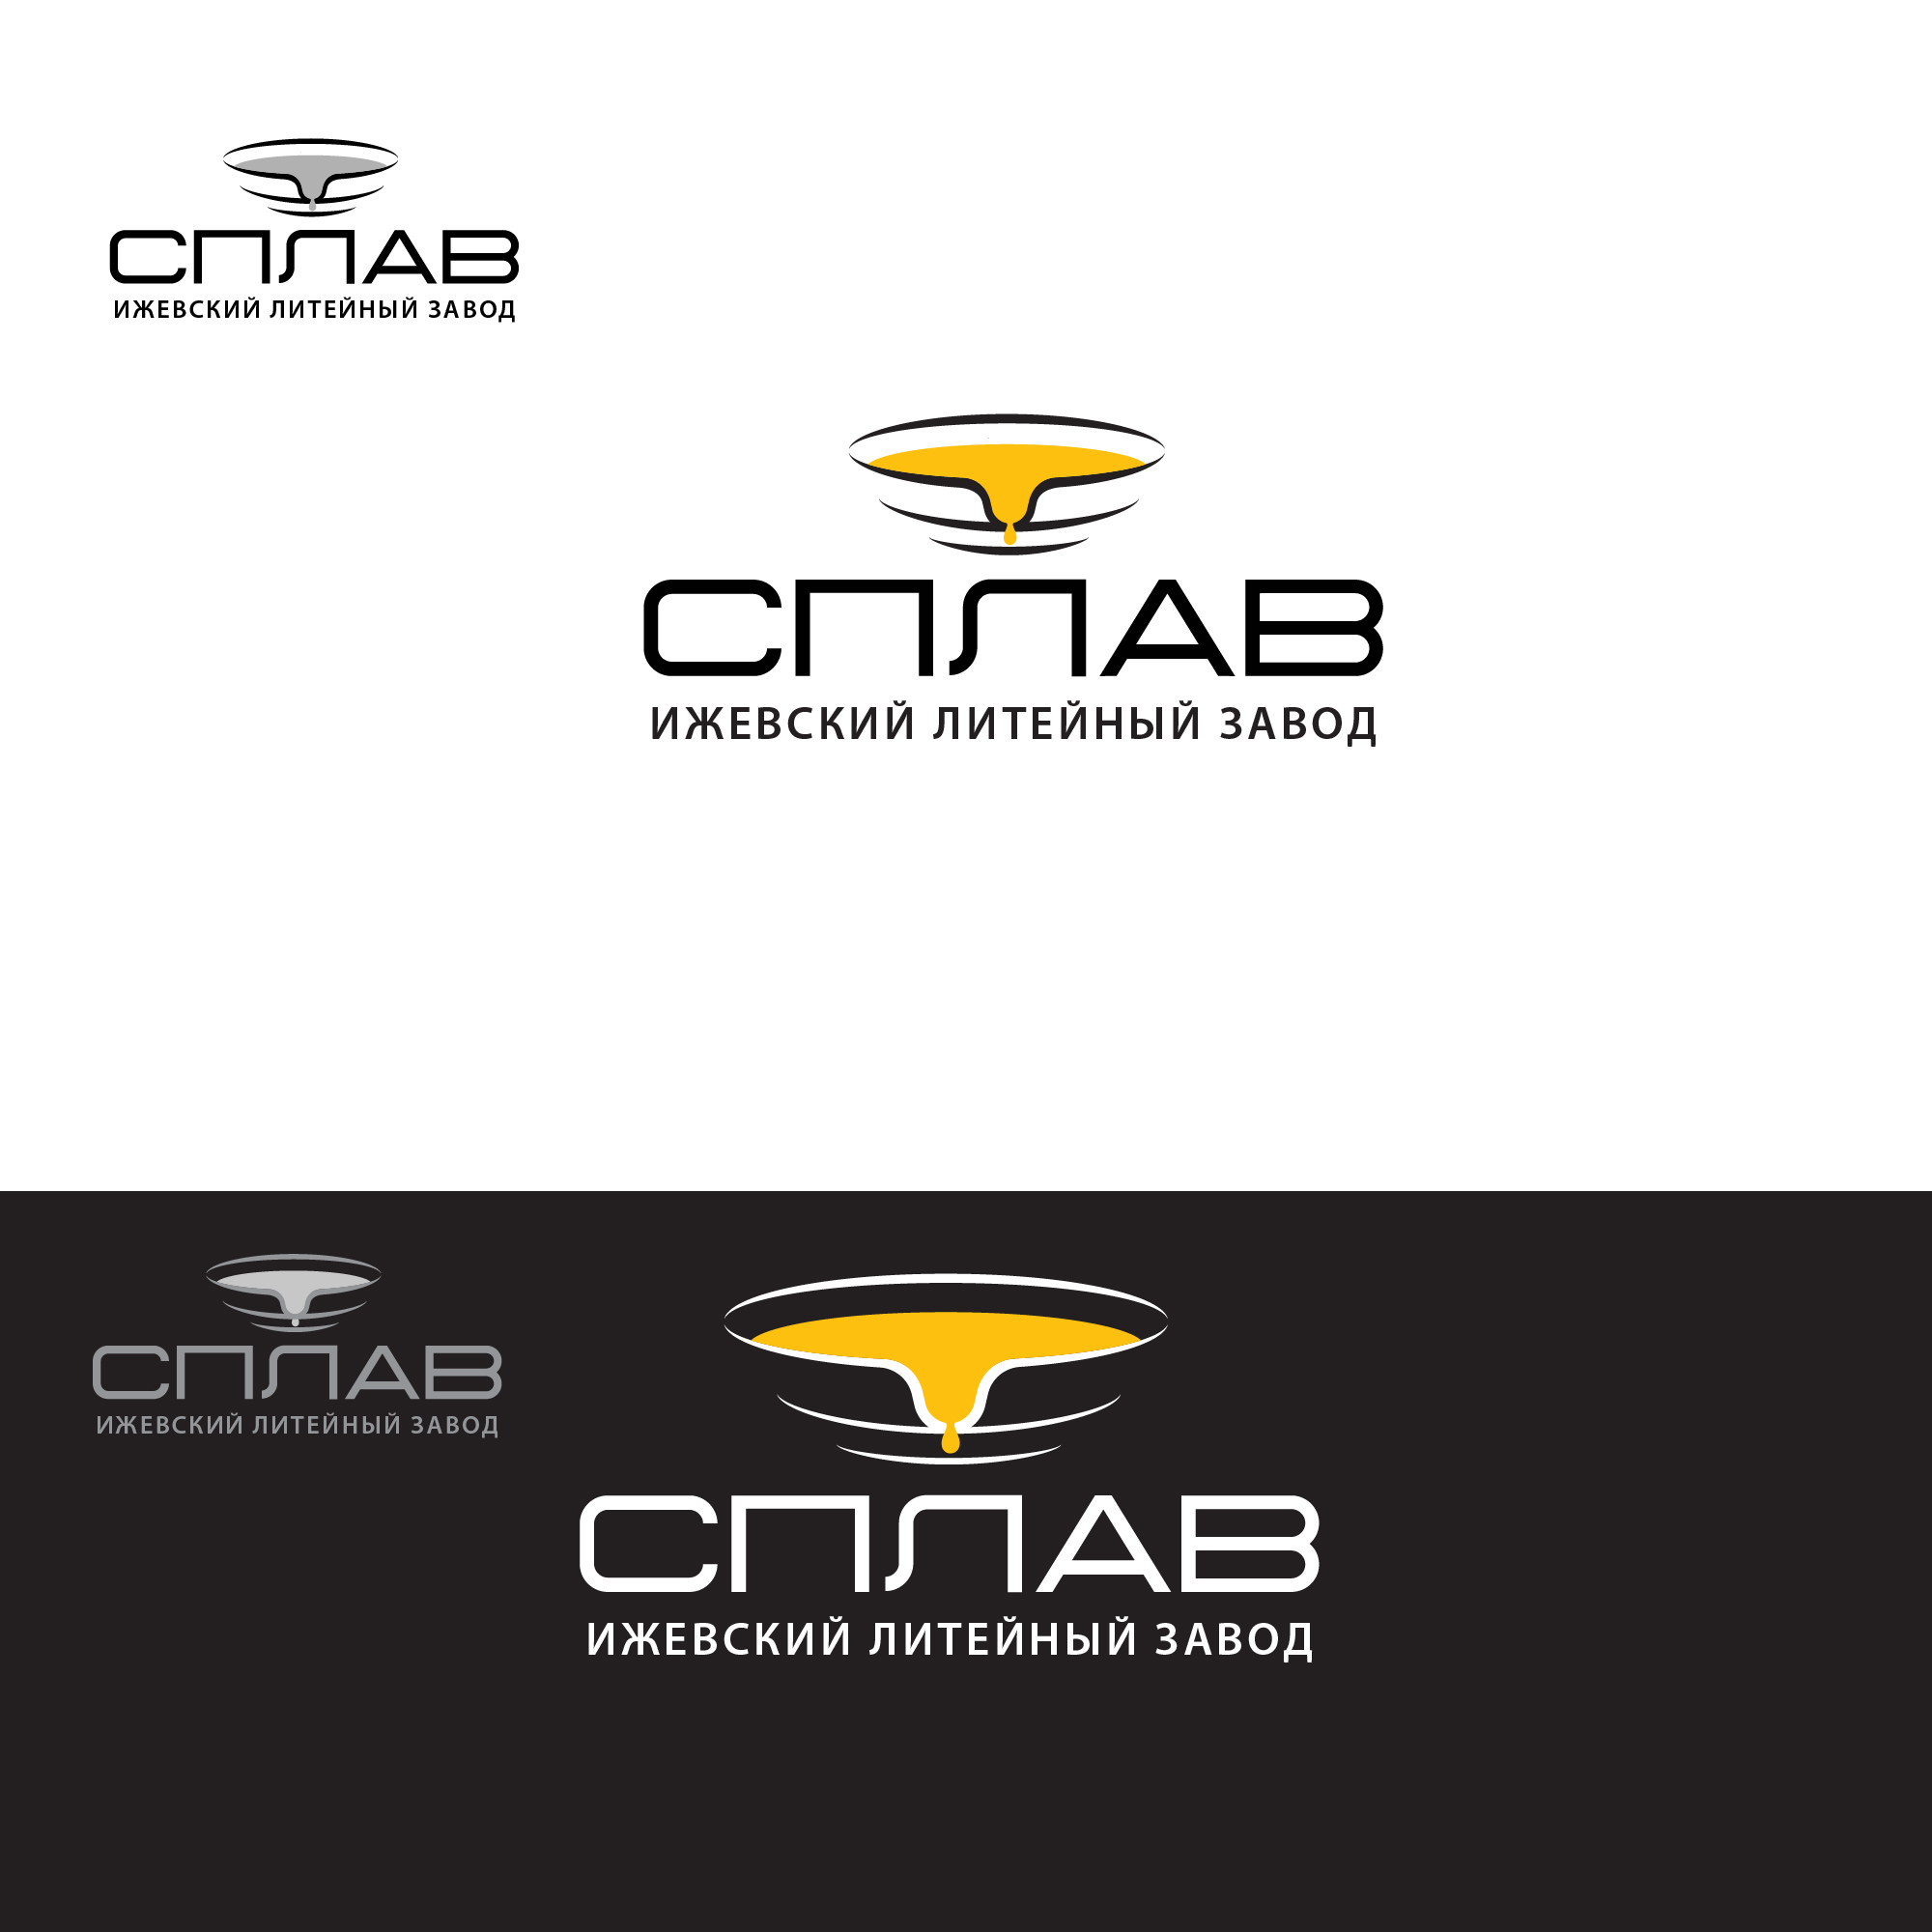 Разработать логотип для литейного завода фото f_3355aff00ea36ed6.jpg